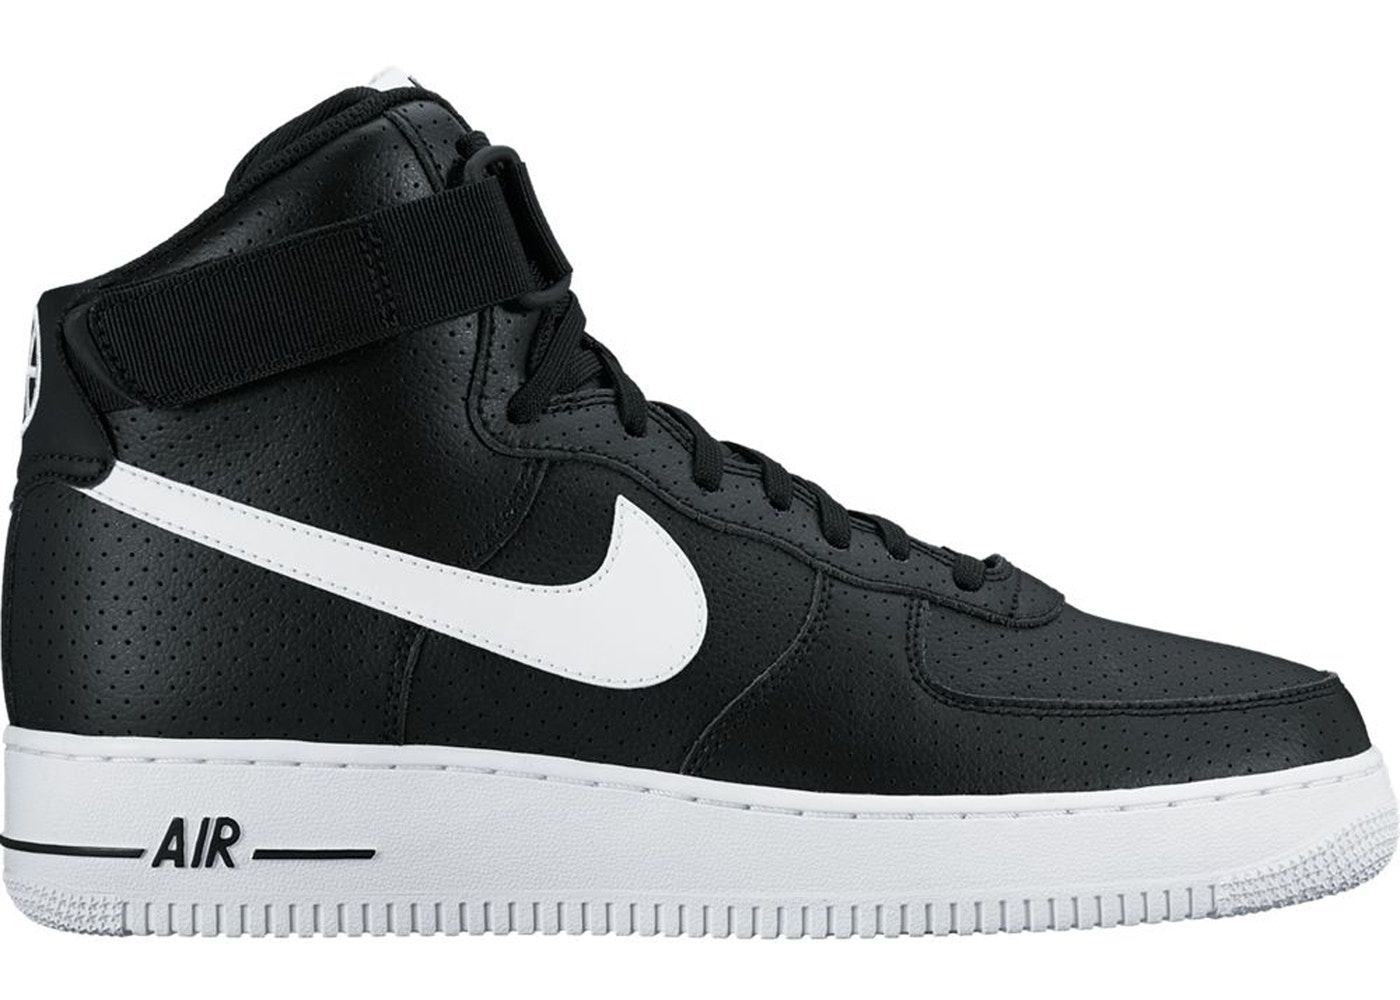 Nike Air Force 1 High Perf Black White